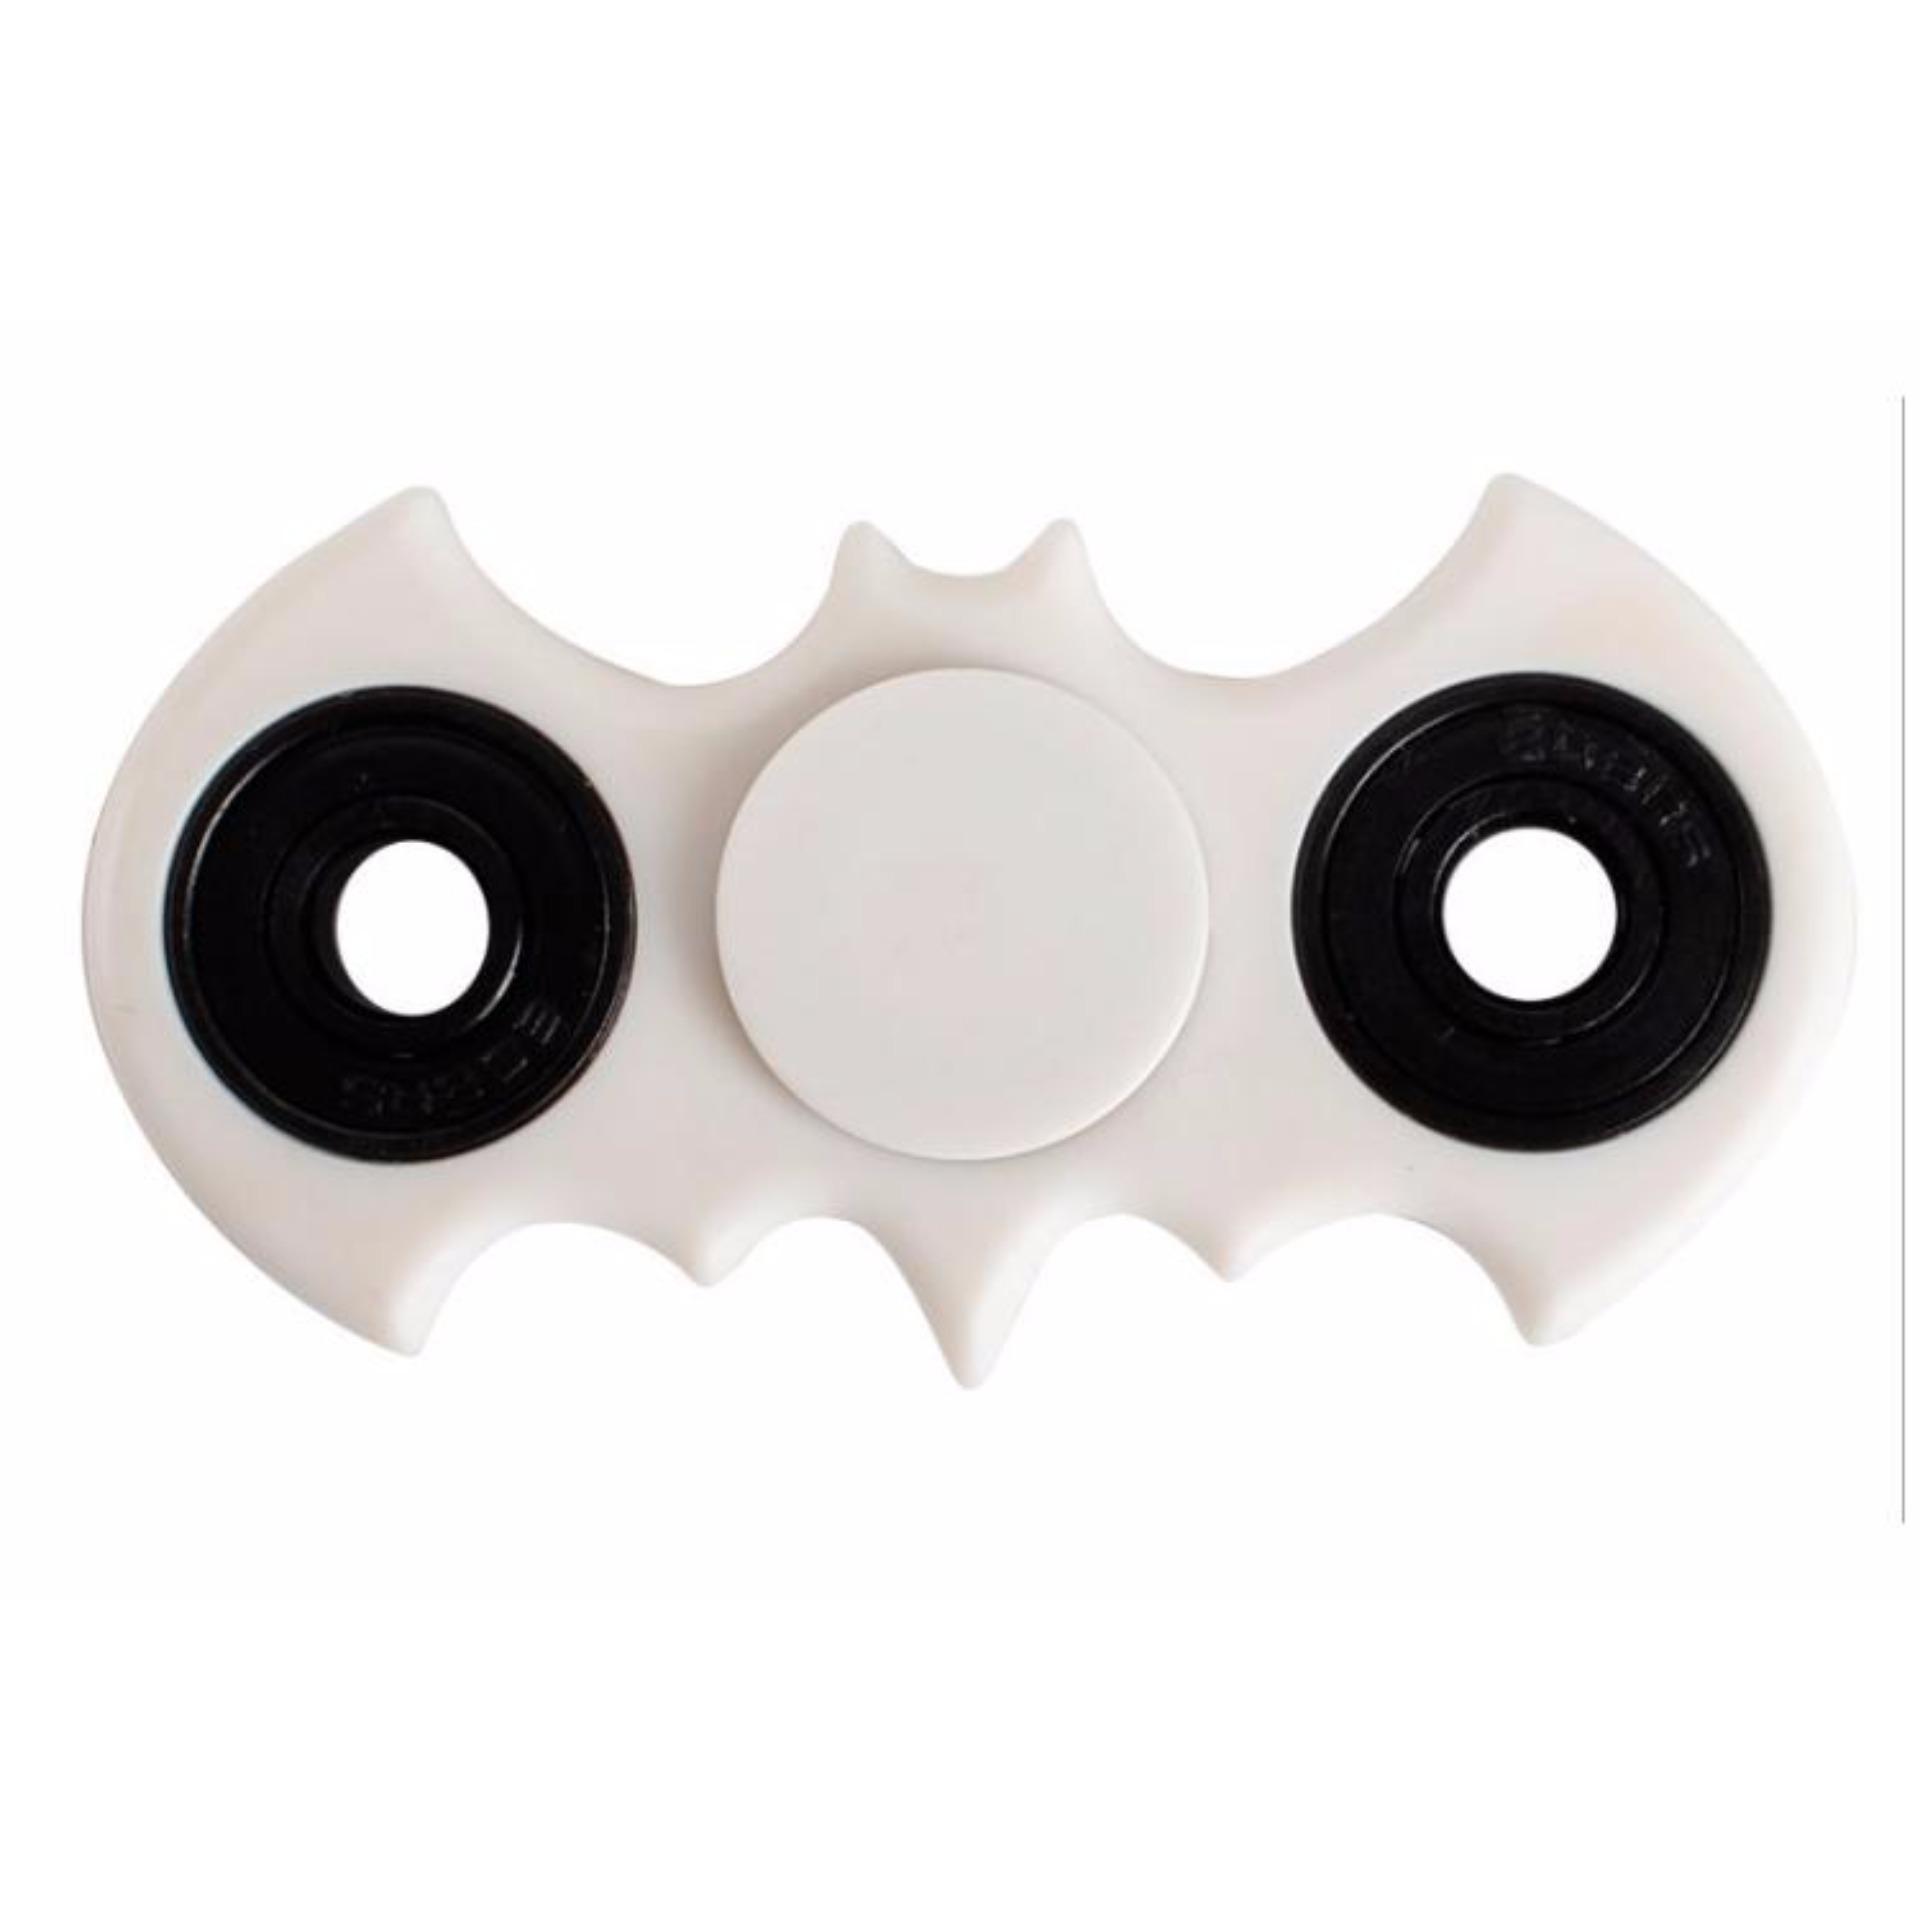 ... Batman Fidget Spinner Hand Toys Mainan EDC Ceramic Ball Focus Games Batman - Putih ...